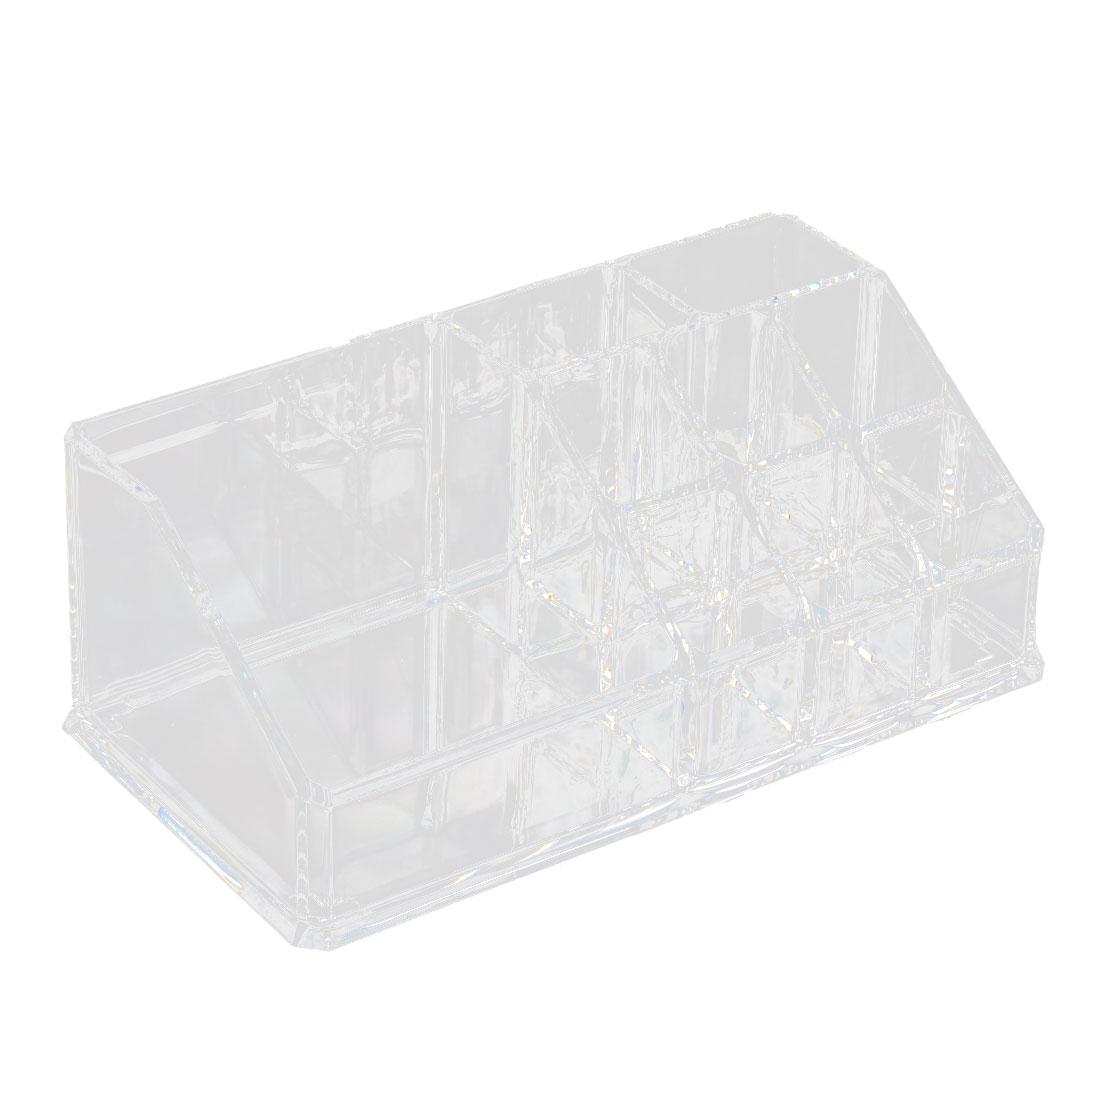 Acrylic 9-stand Trapezoid Makeup Cosmetic Organizer Display Stand Storage Box